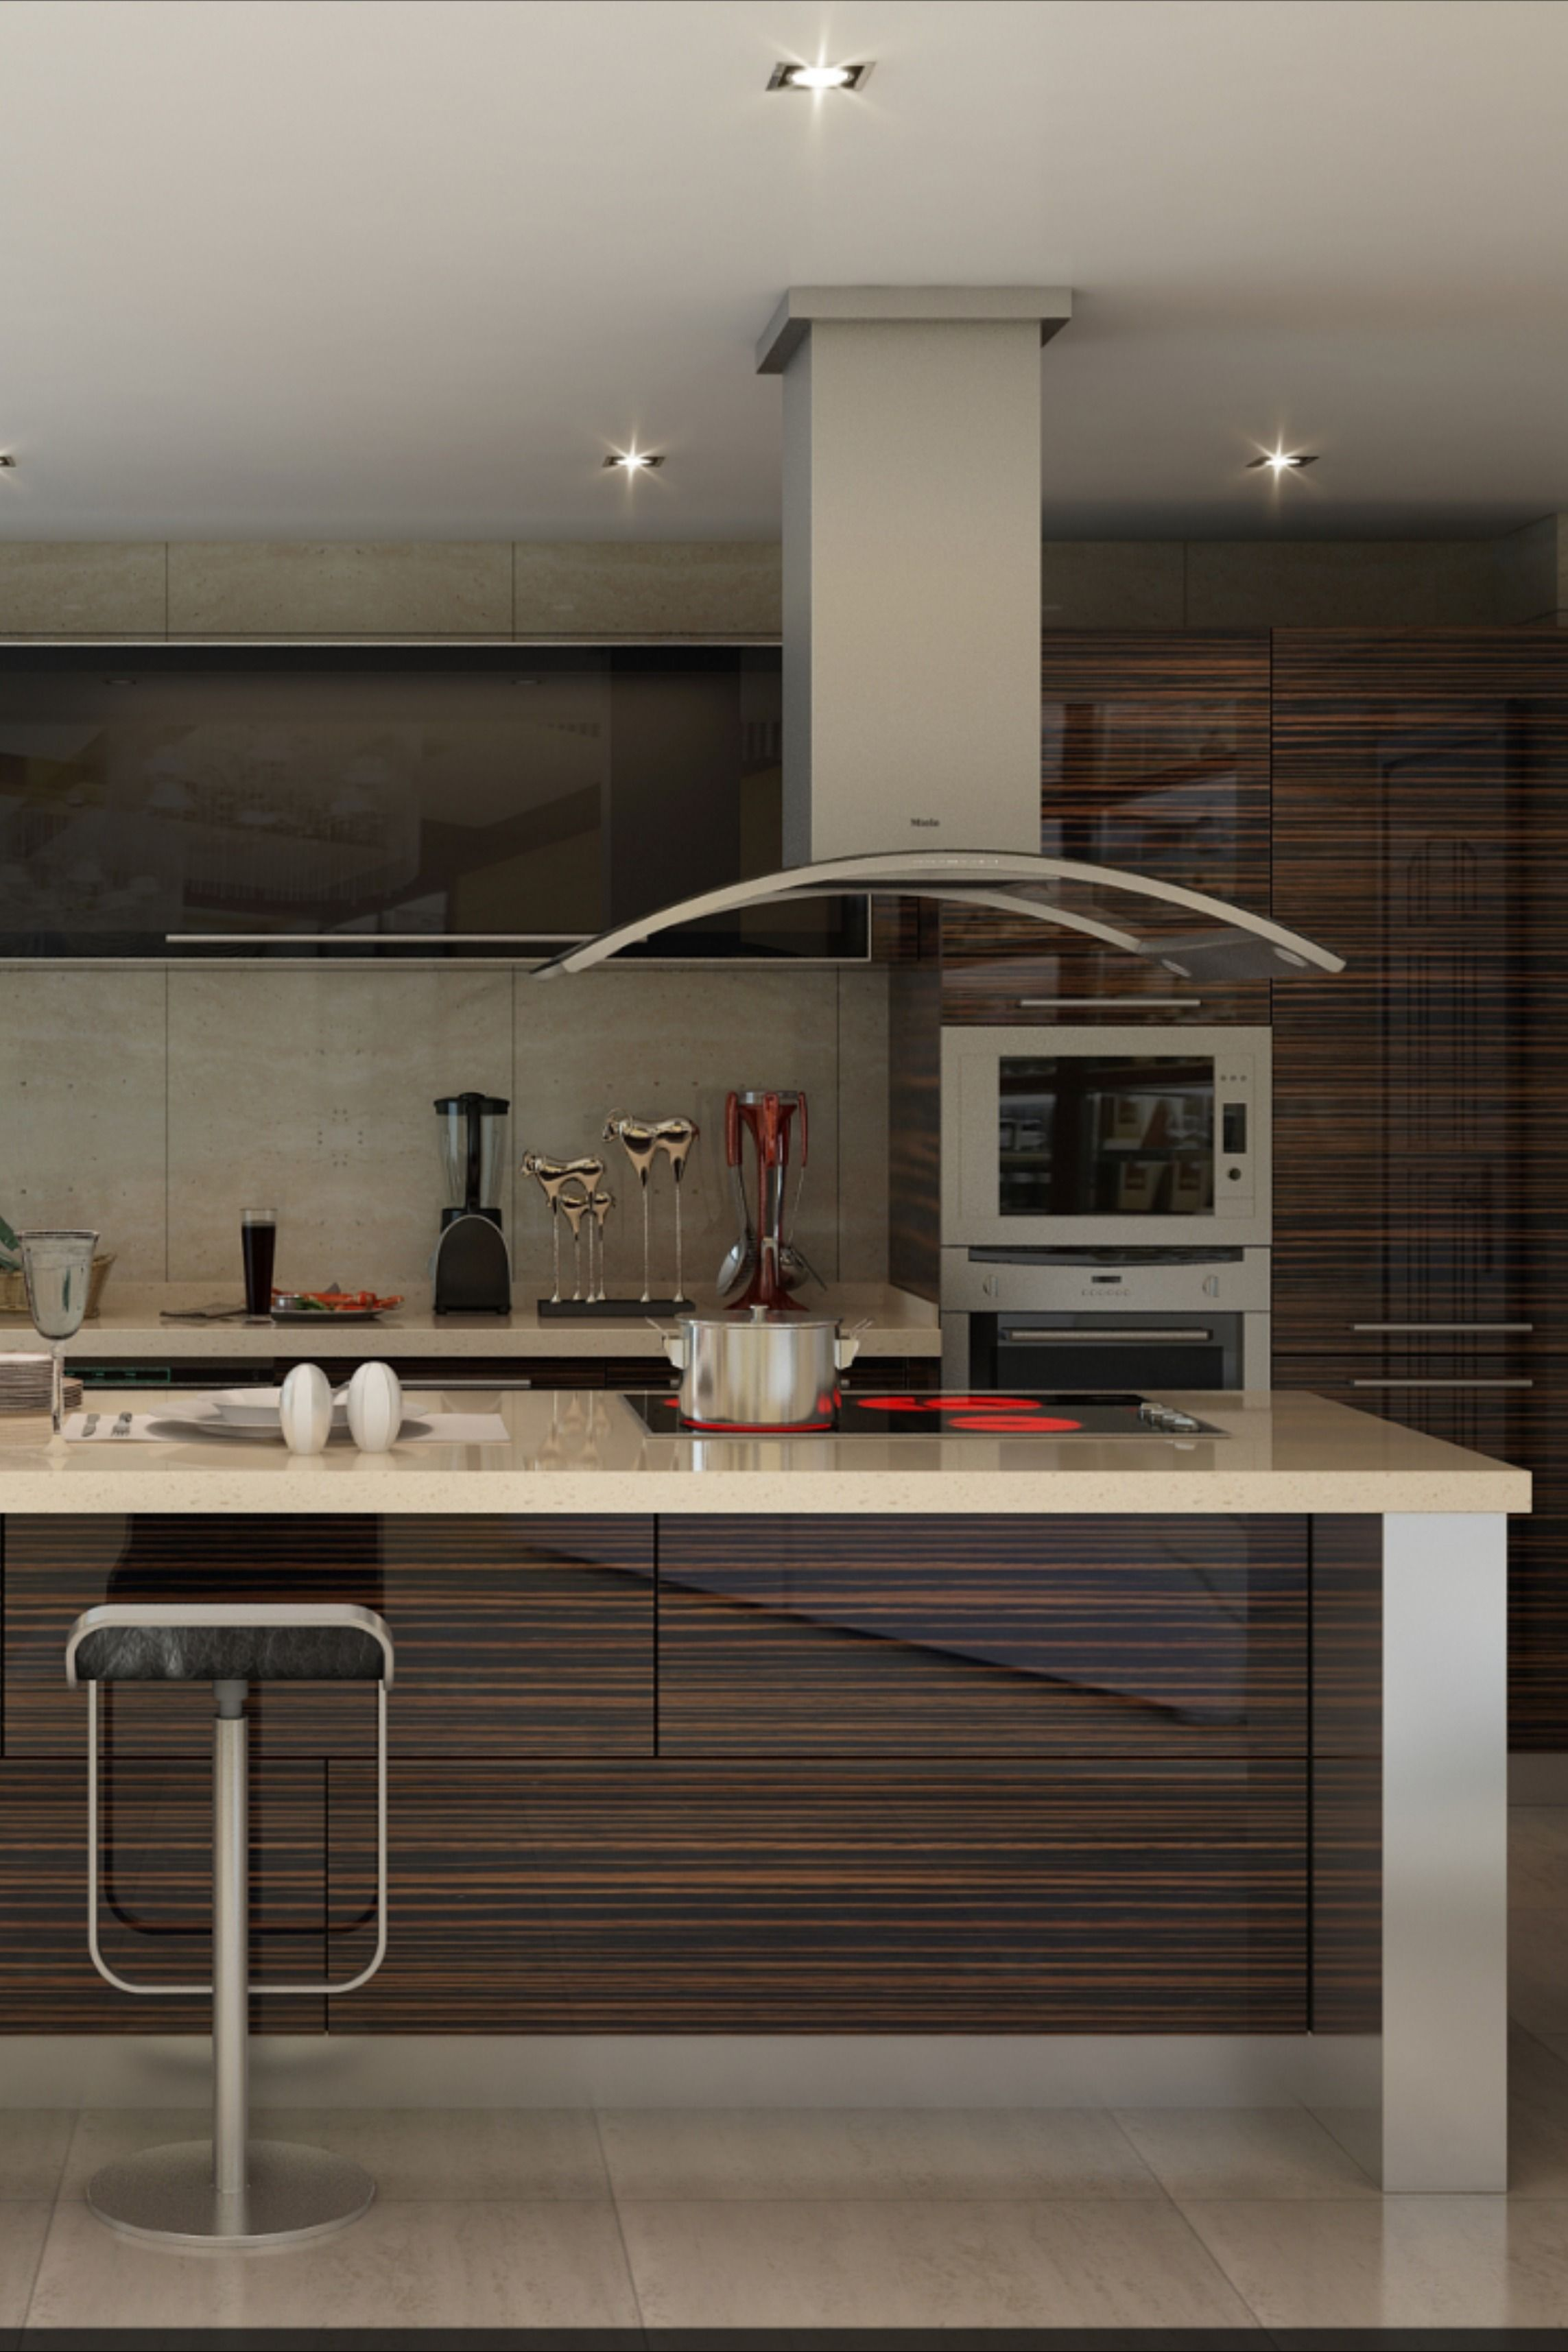 Acrylic Kitchen Cabinet In 2020 Kitchen Cabinets Kitchen Cabinet